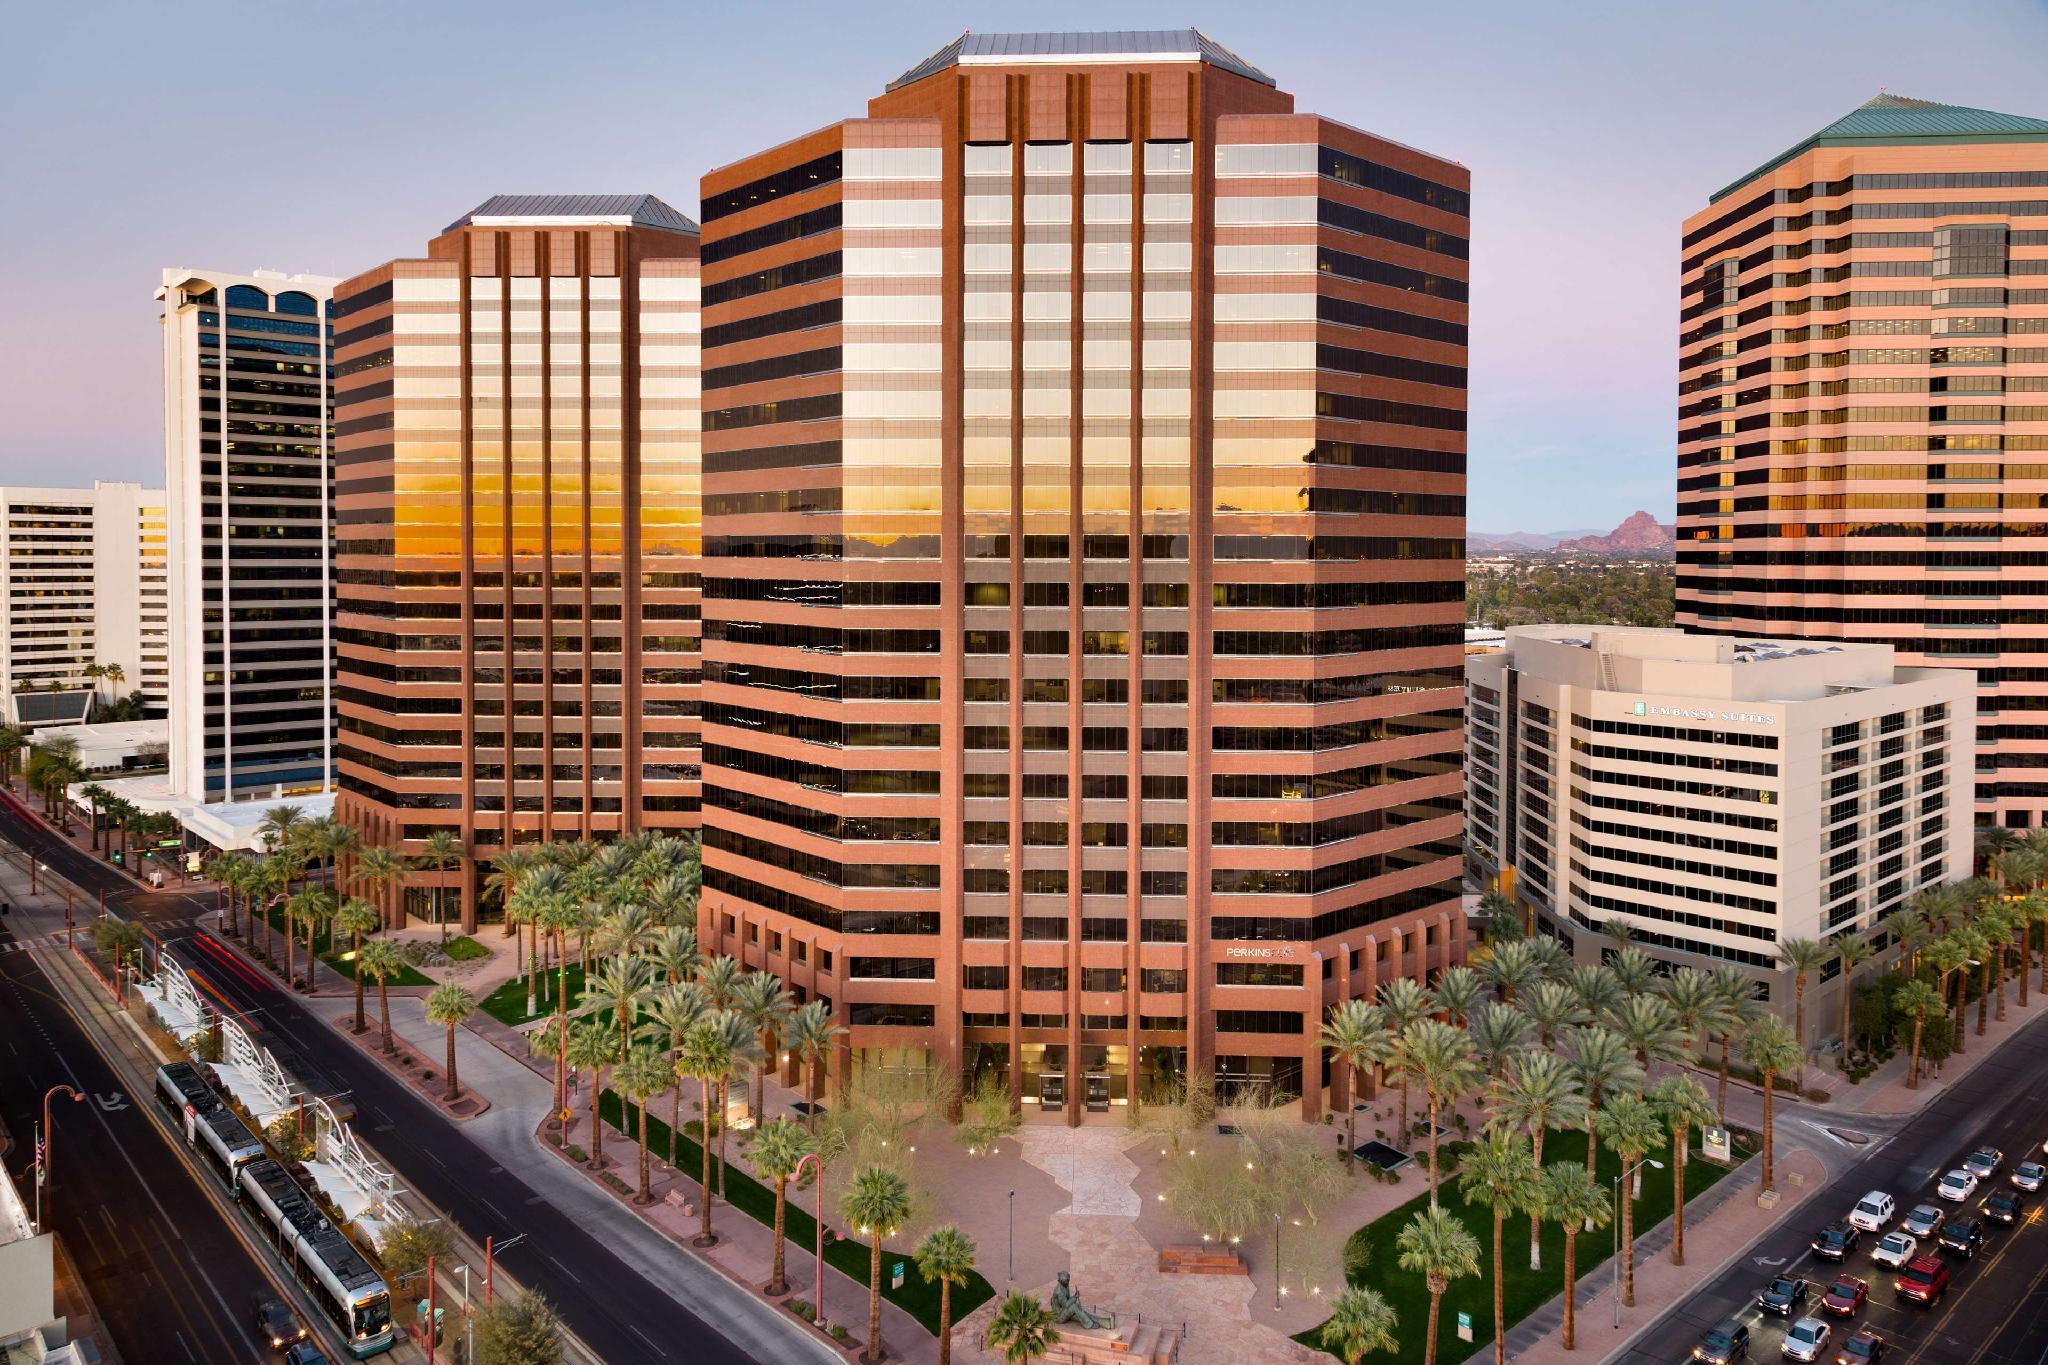 Embassy Suites By Hilton Phoenix Downtown